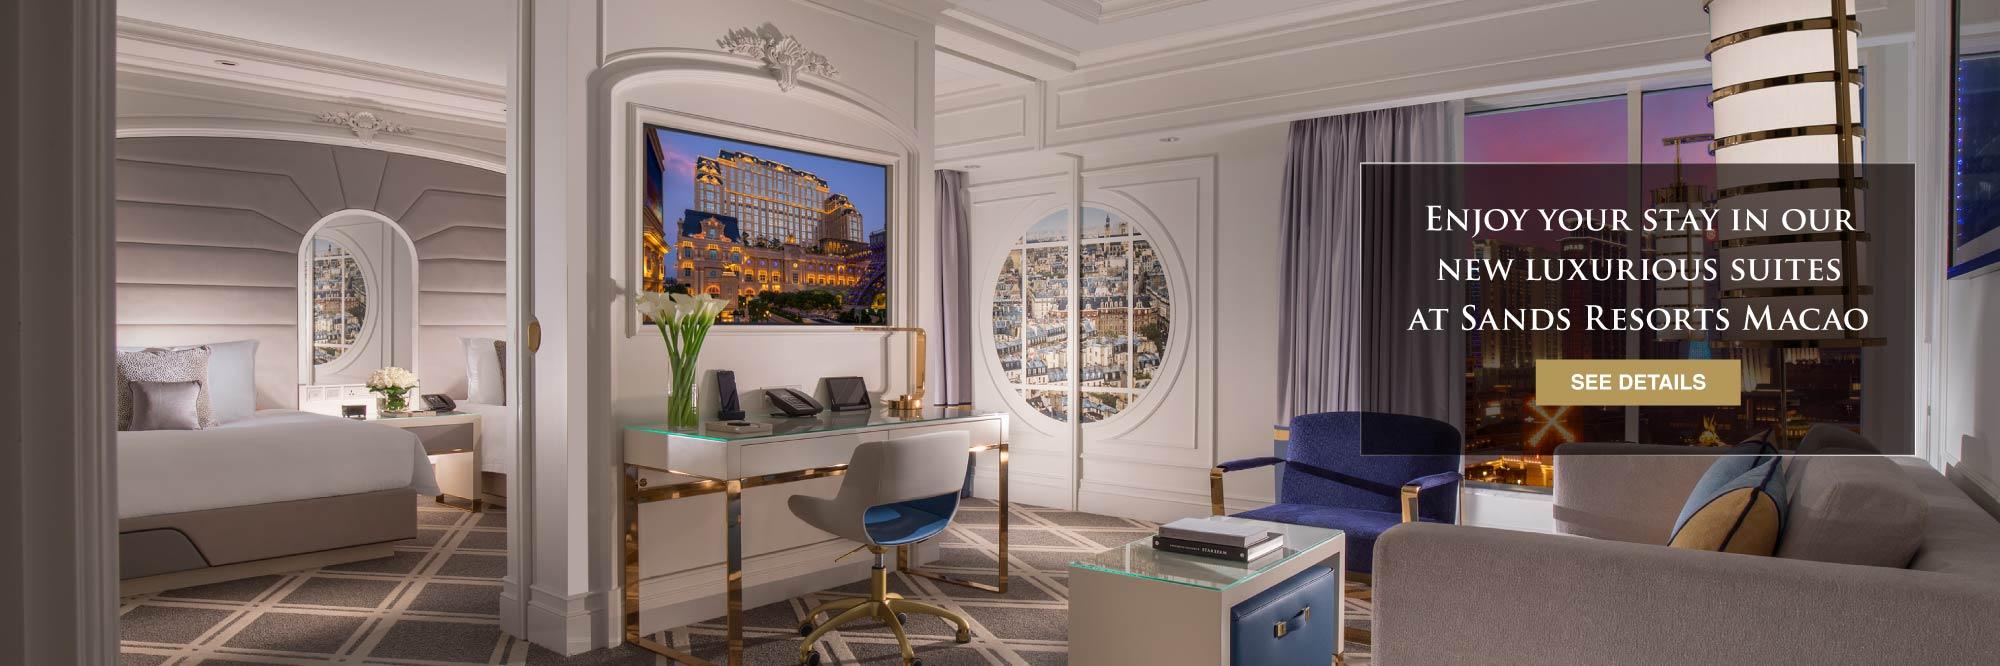 Sands Resorts Macao Extraordinary New Suite Room